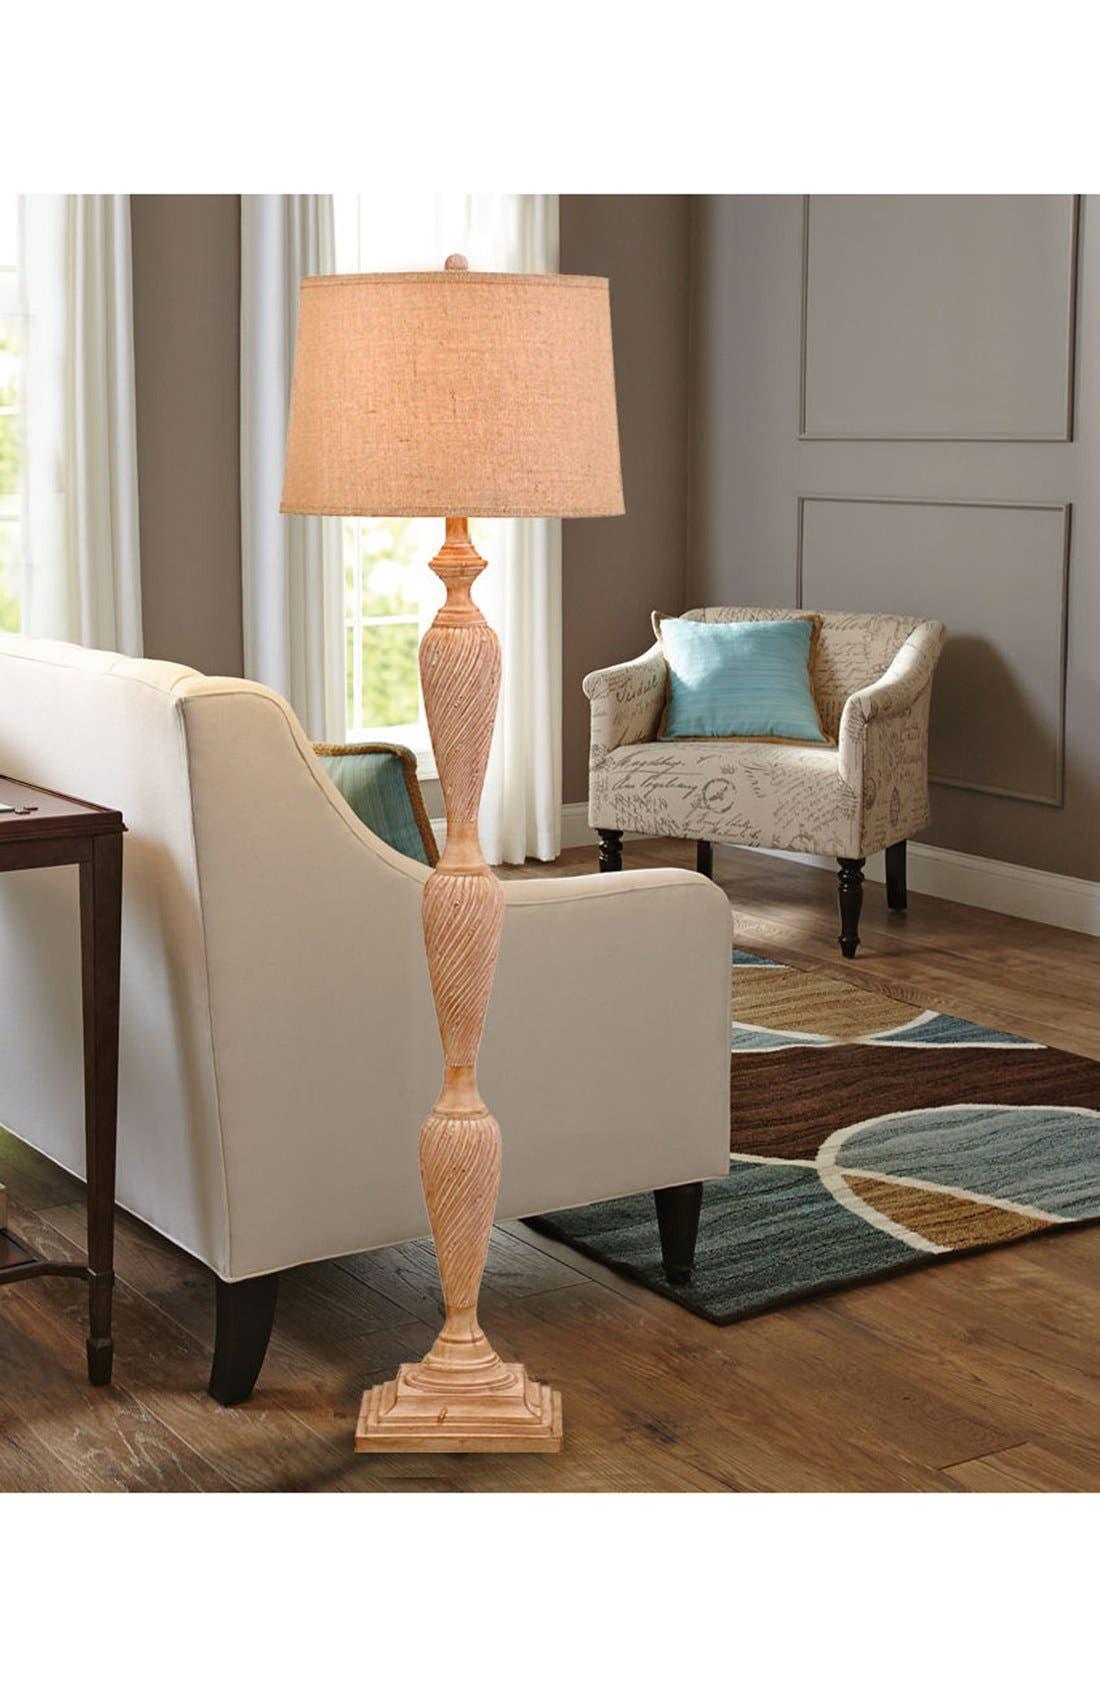 JAlexander Scroll Engraved Floor Lamp,                             Alternate thumbnail 2, color,                             250